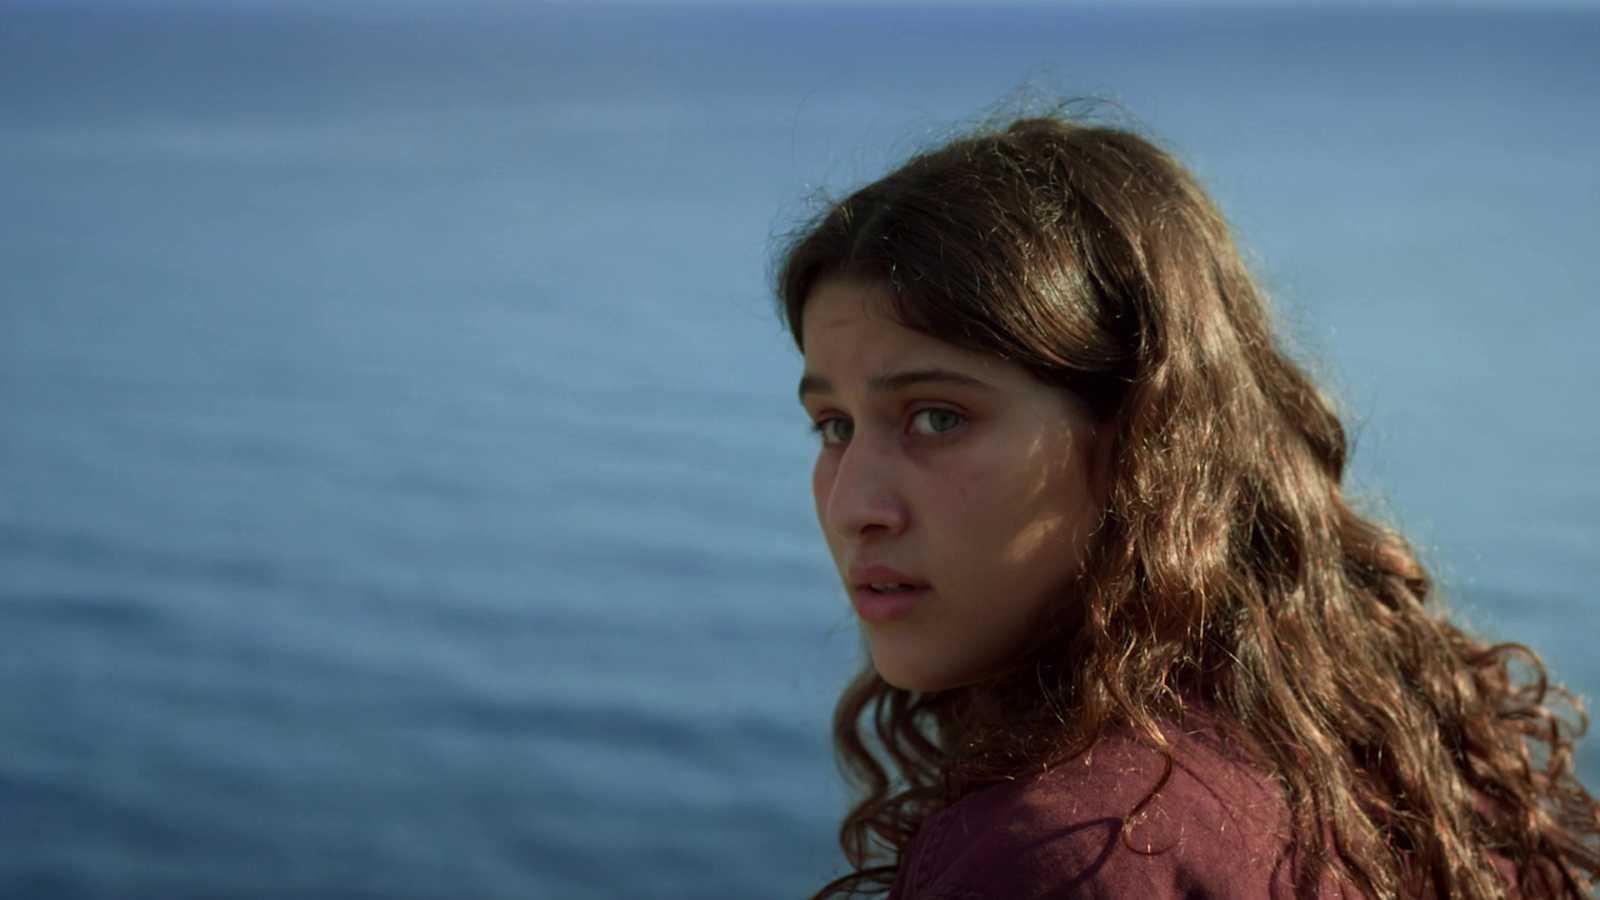 La caza. Tramuntana - Julia y Bela encuentran a Samiah